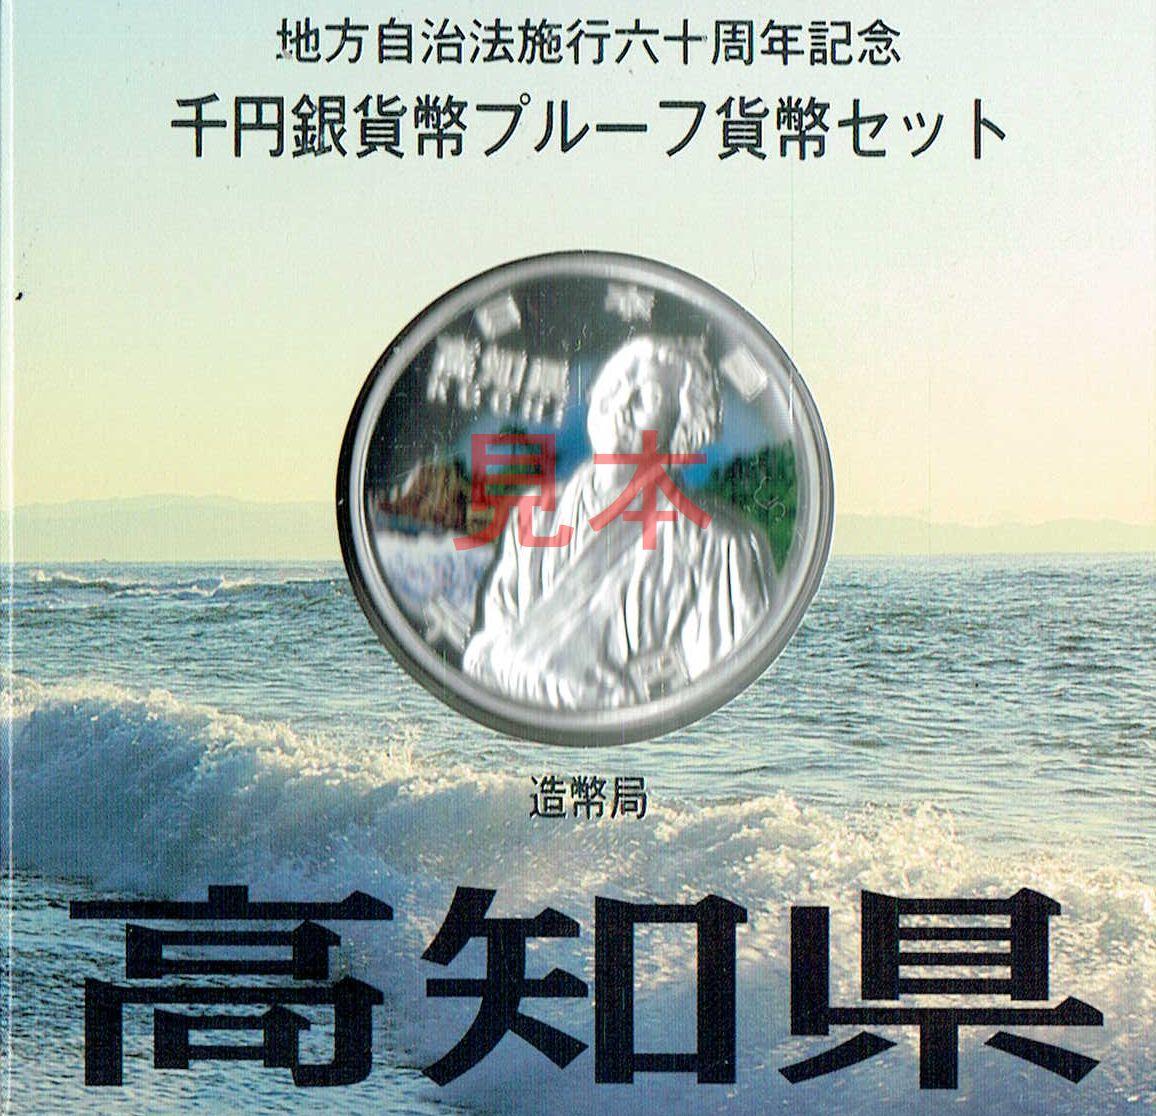 商品名「地方自治法施行60周年記念千円銀貨幣プルーフ Aセット 高知県」